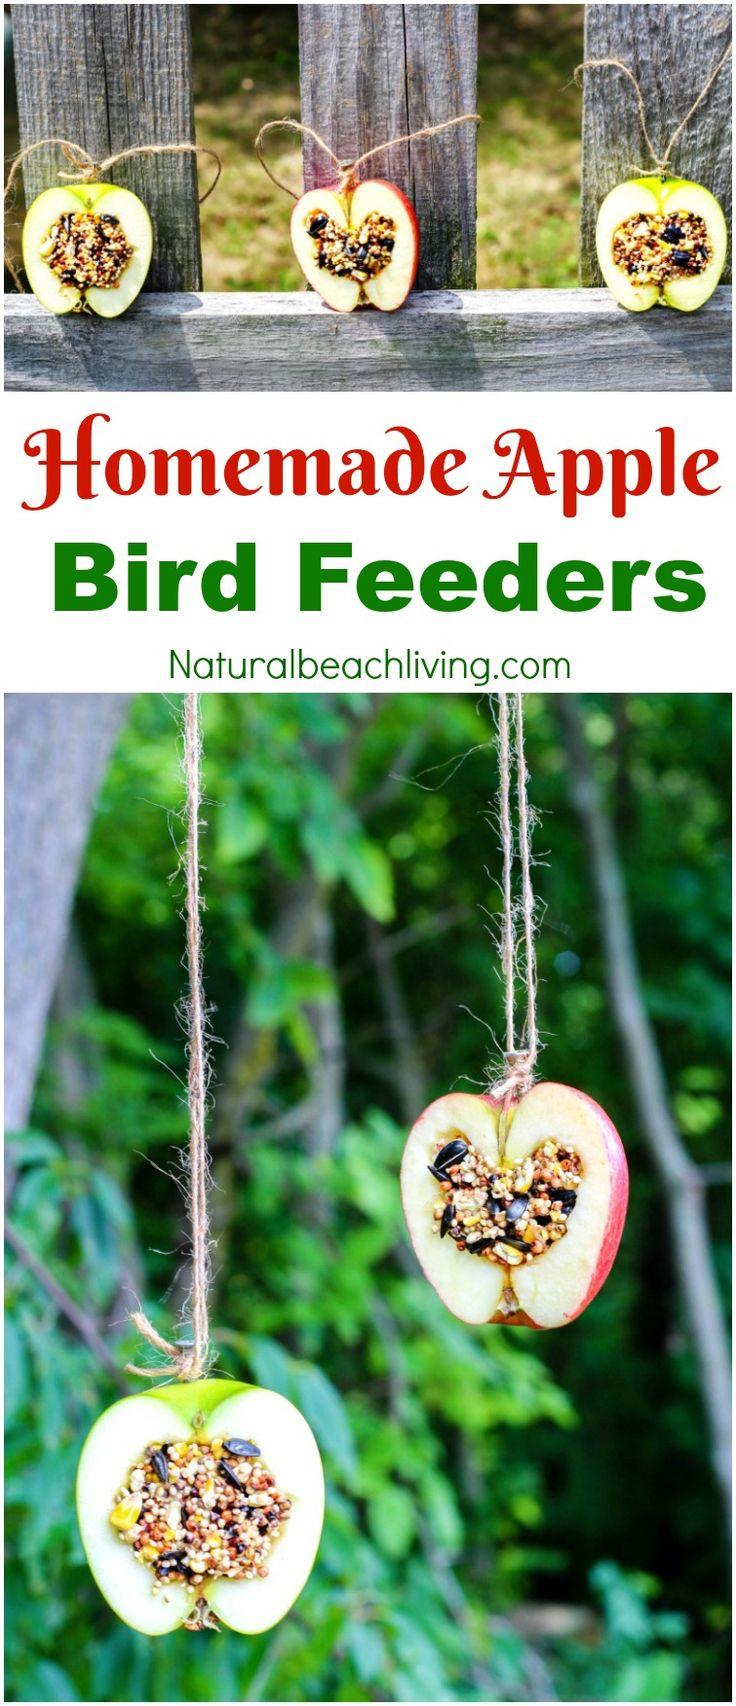 How to Make Apple Birdseed Homemade Bird Feeders Everyone Loves